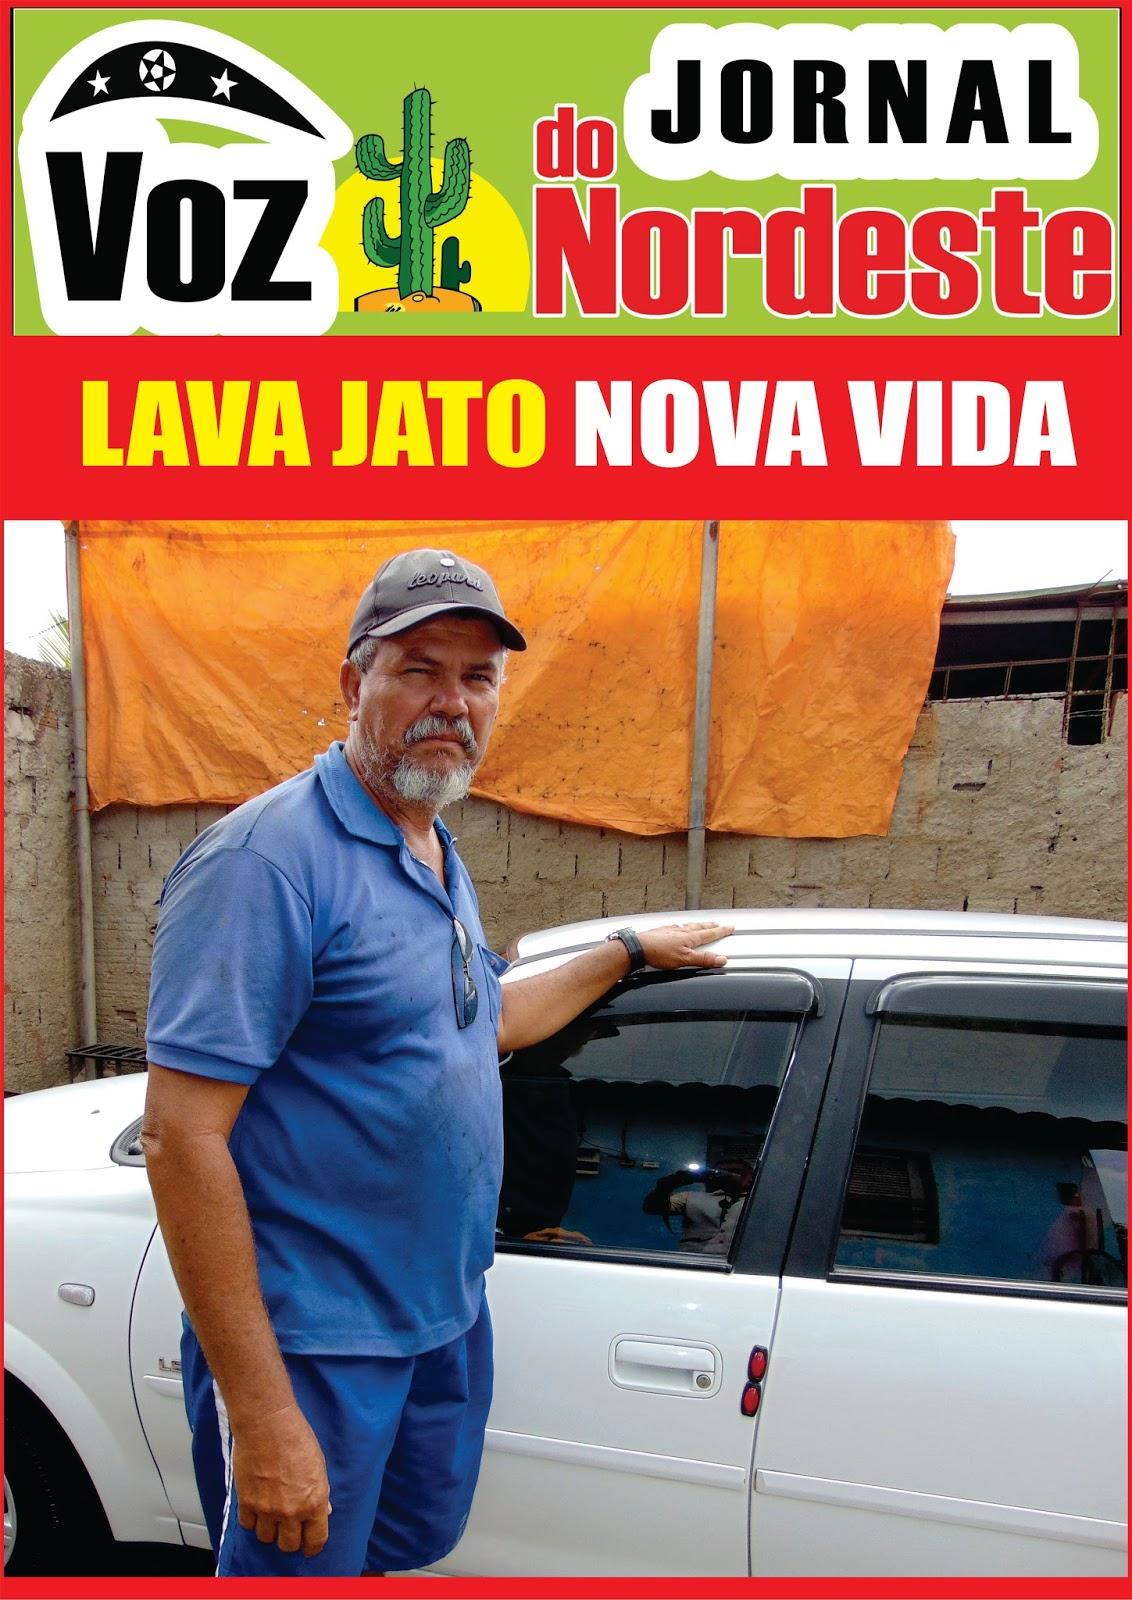 e91600bdbf1 Jornal Voz do Nordeste.  LAVA JATO NOVA VIDA  LAVAMOS CARROS DE ...